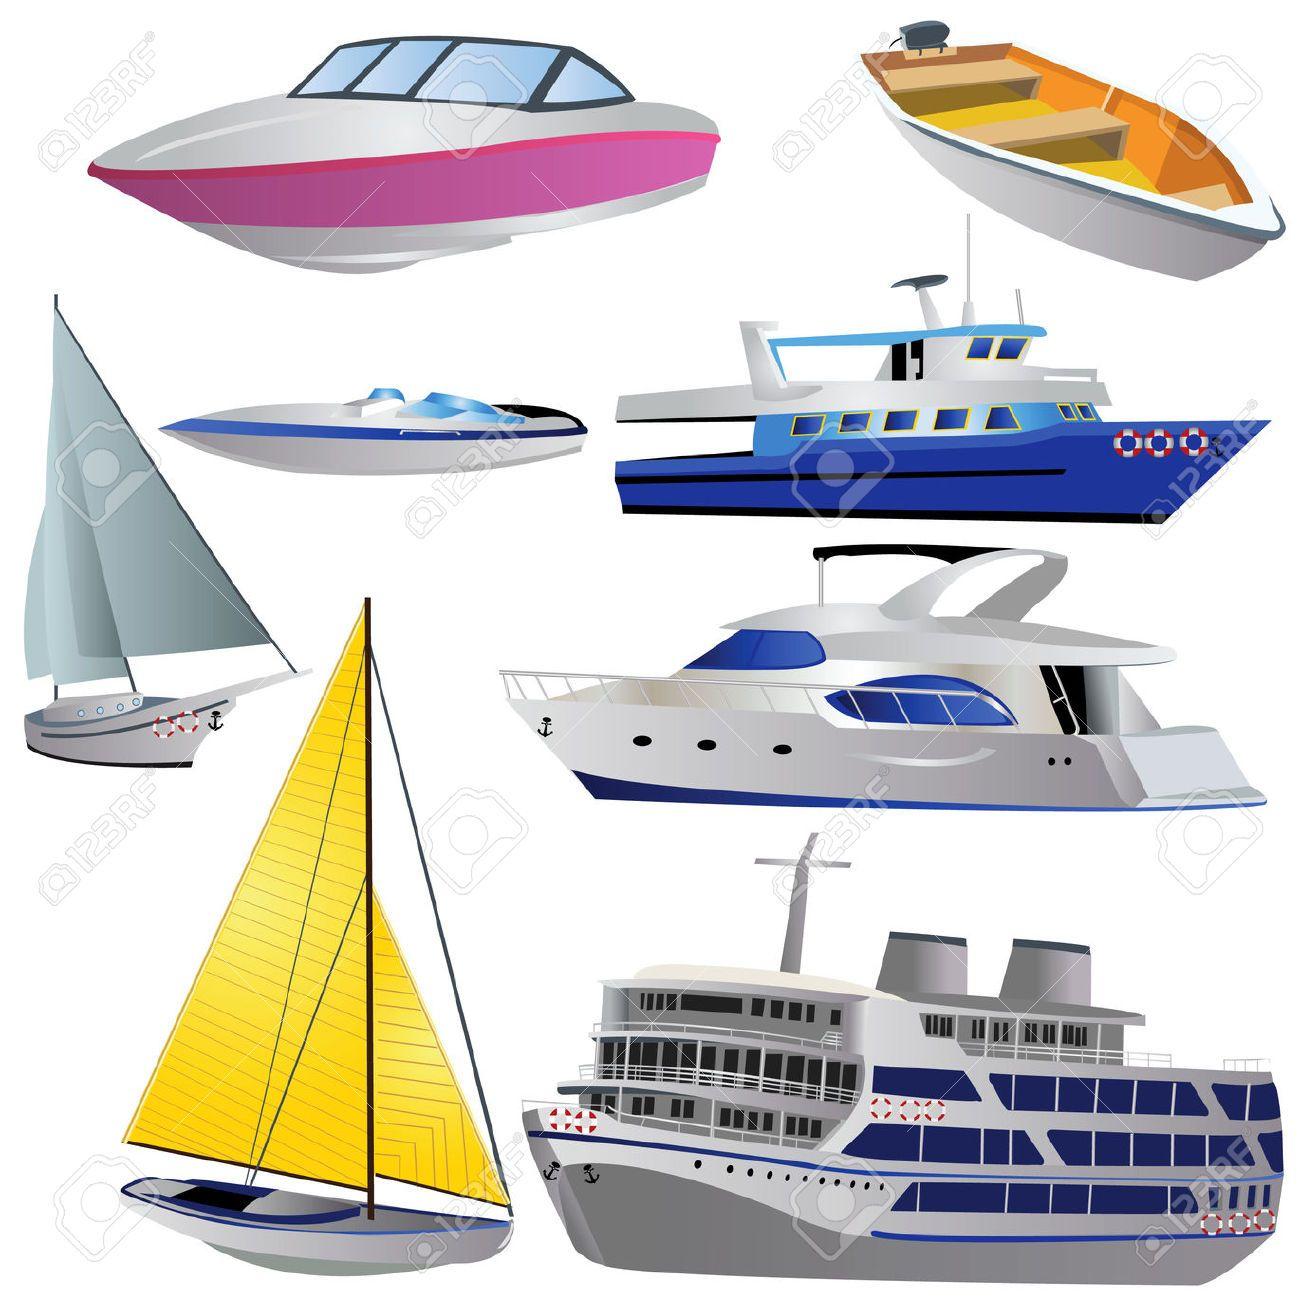 Ocho tipos de barcos diferentes. Colores variados. Fondo